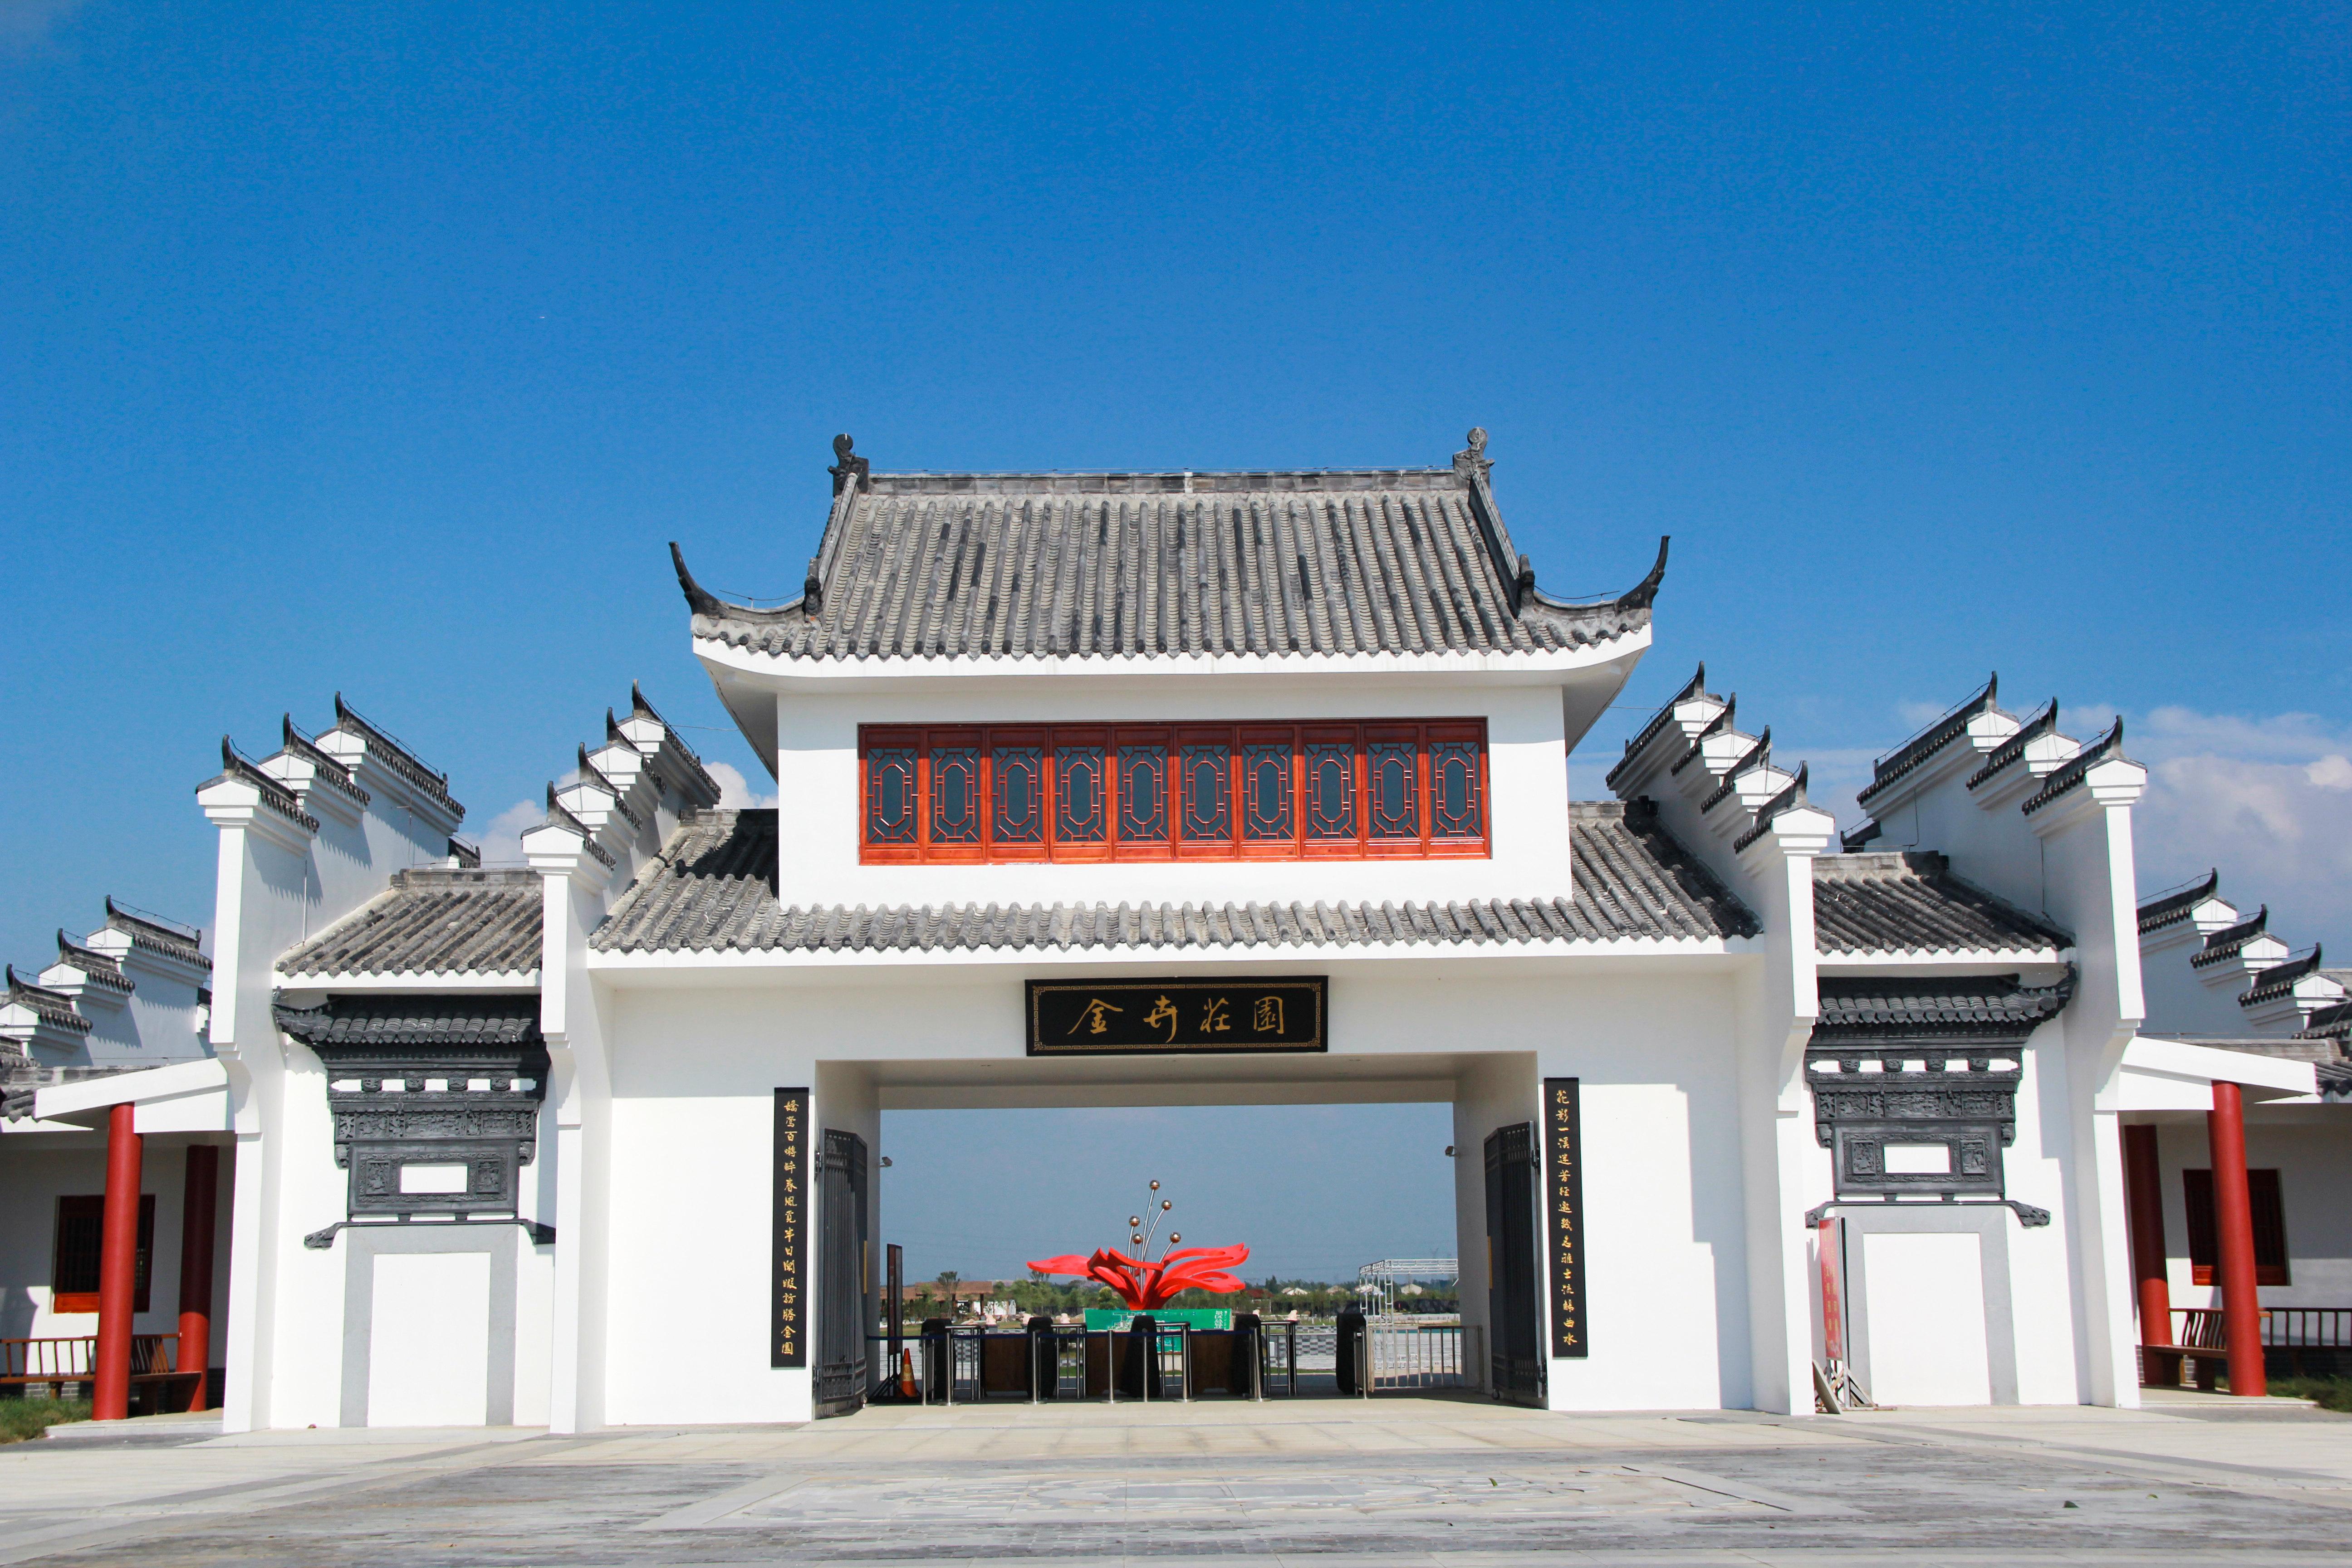 Jinhui Manor